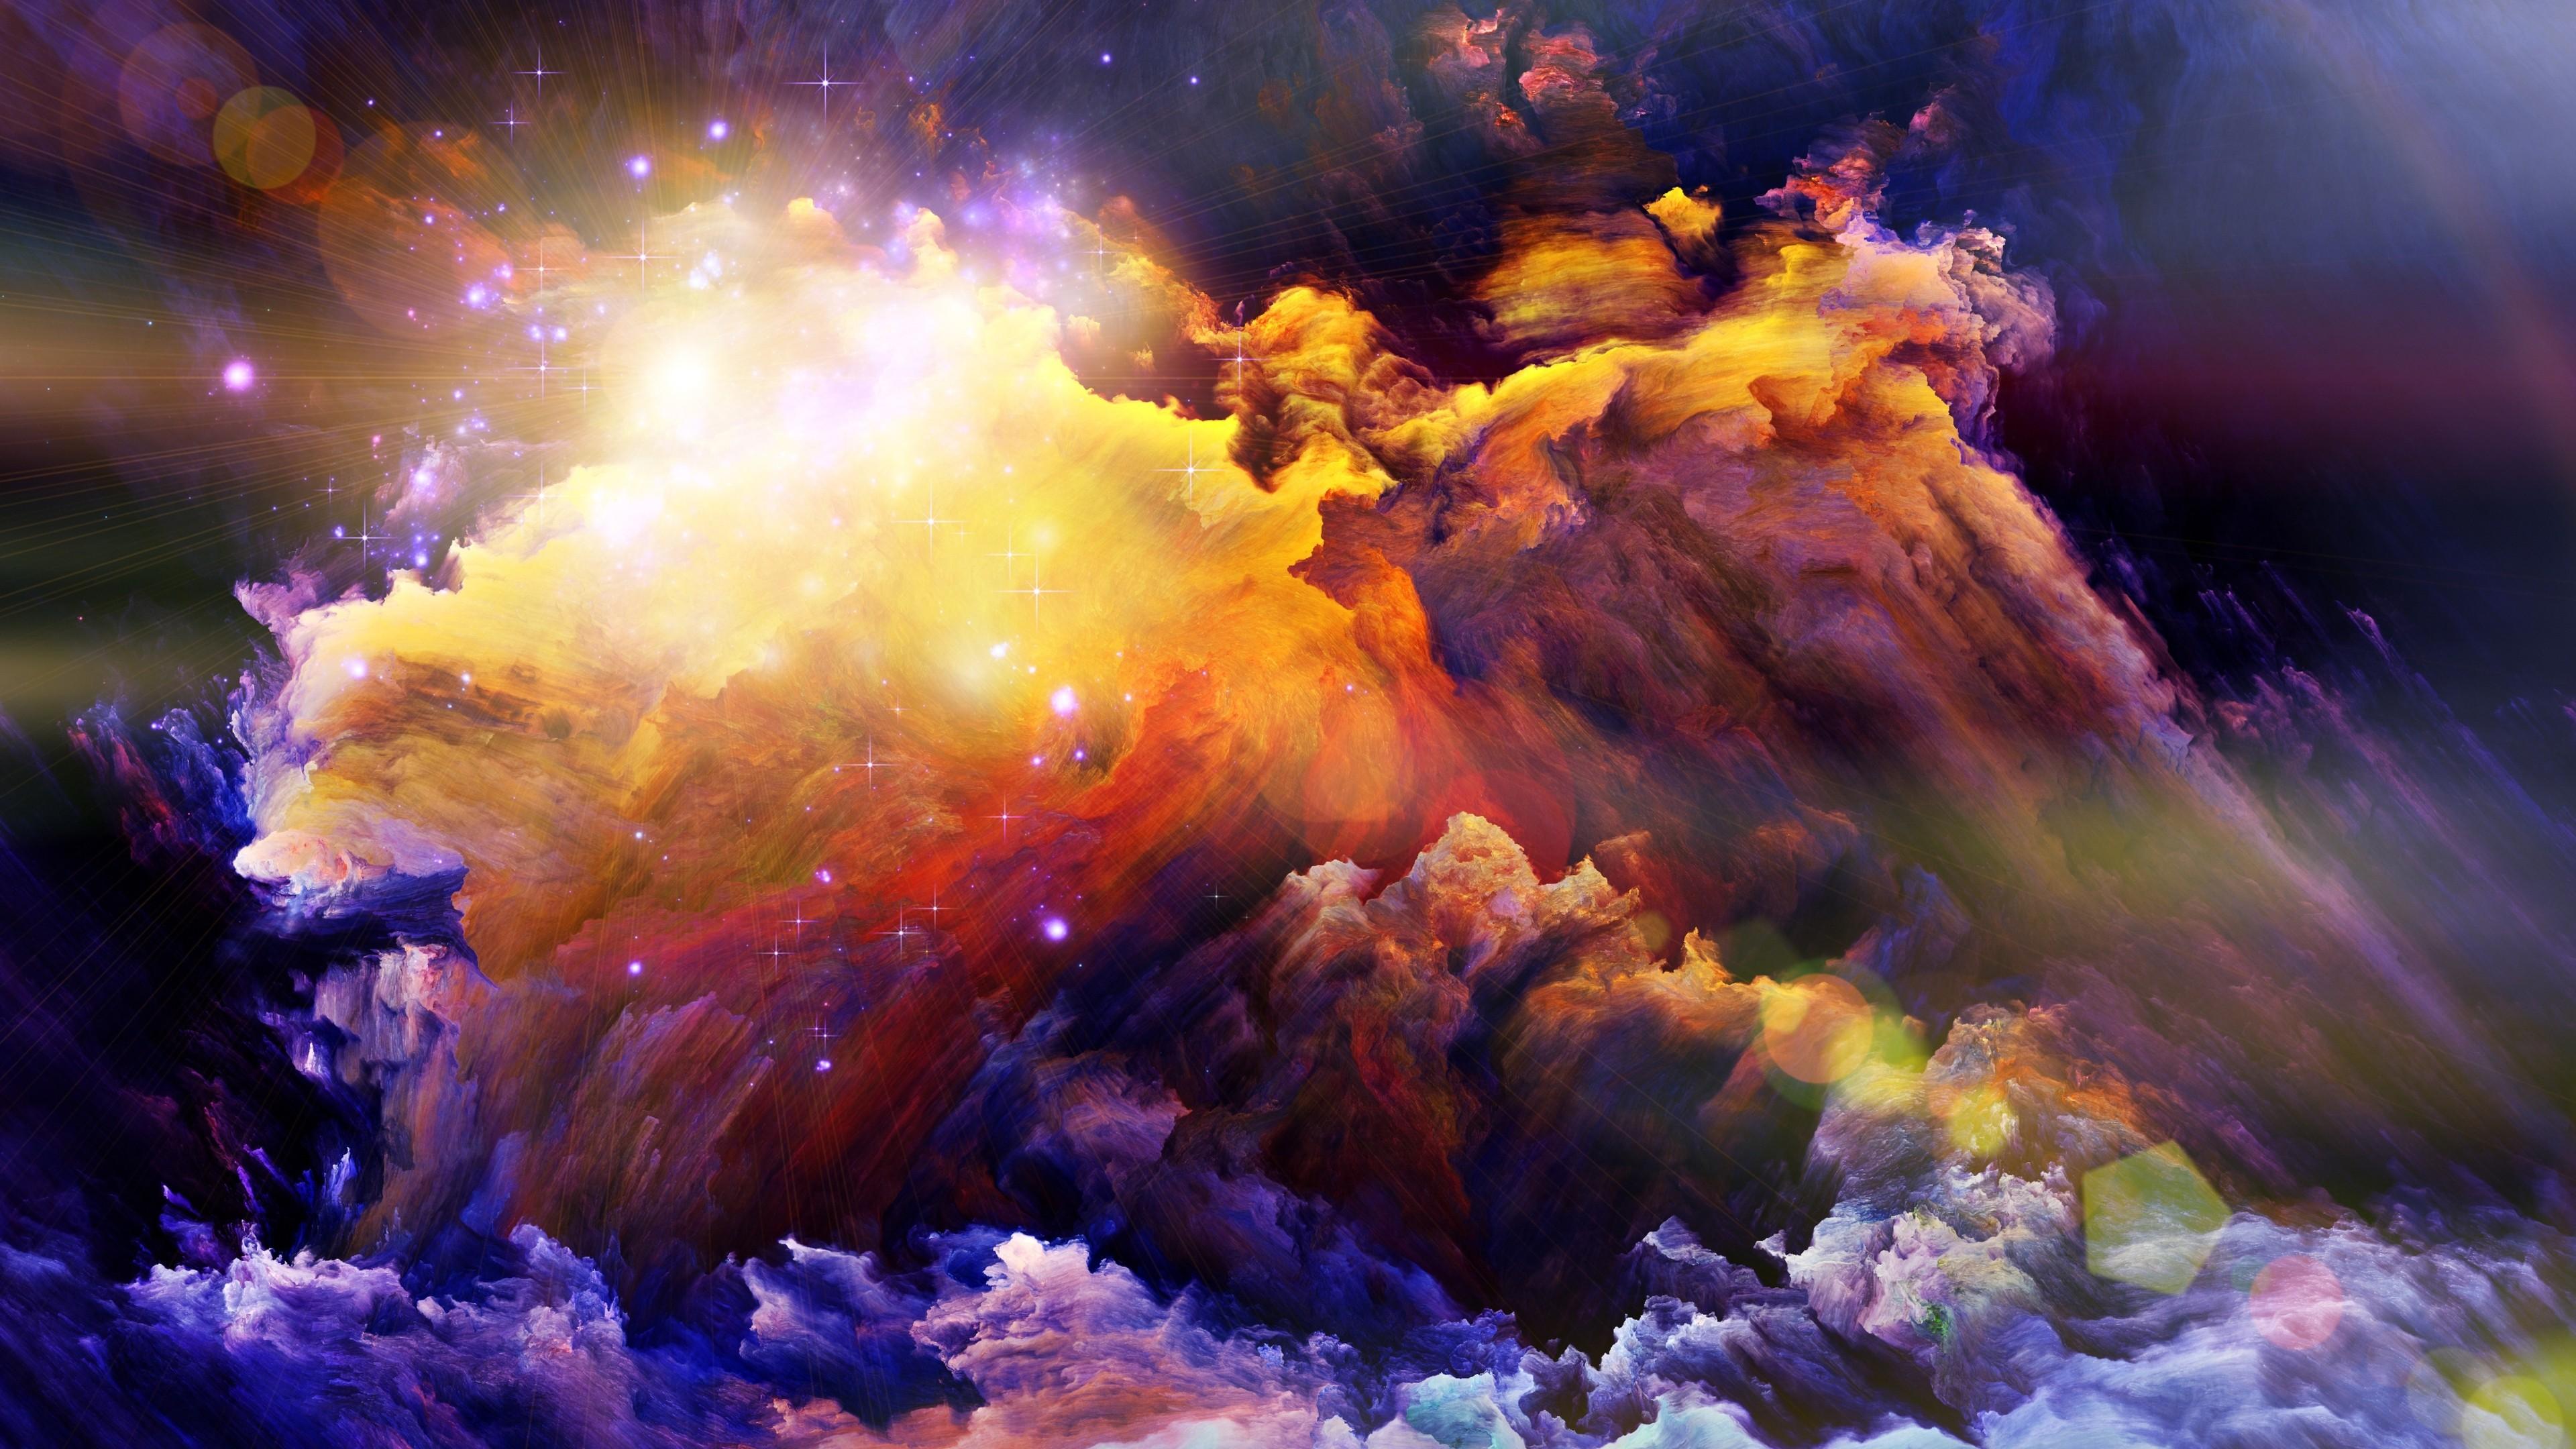 space stars abstract digital art nebula 4k 1540754452 - Space Stars Abstract Digital Art Nebula 4k - stars wallpapers, space wallpapers, nebula wallpapers, hd-wallpapers, digital art wallpapers, artist wallpapers, abstract wallpapers, 4k-wallpapers